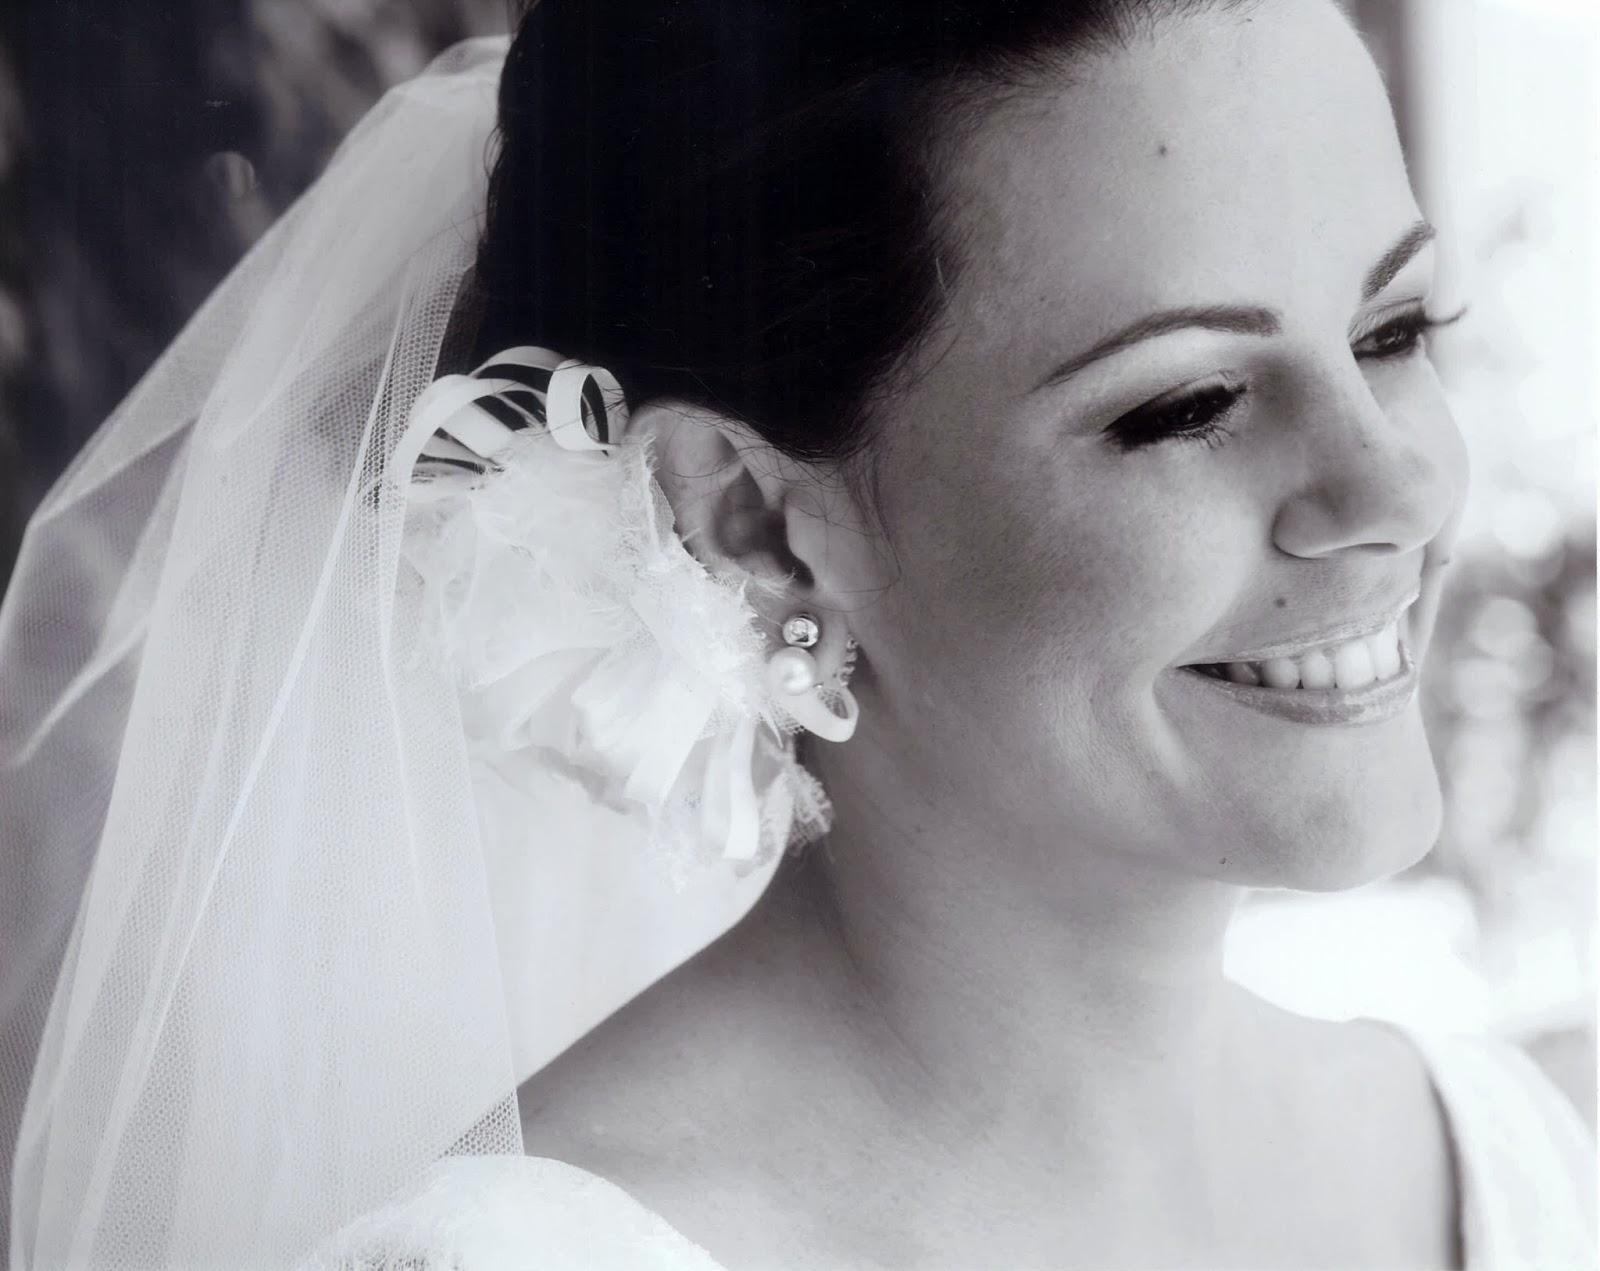 Cristiano marca michael vestido de novia